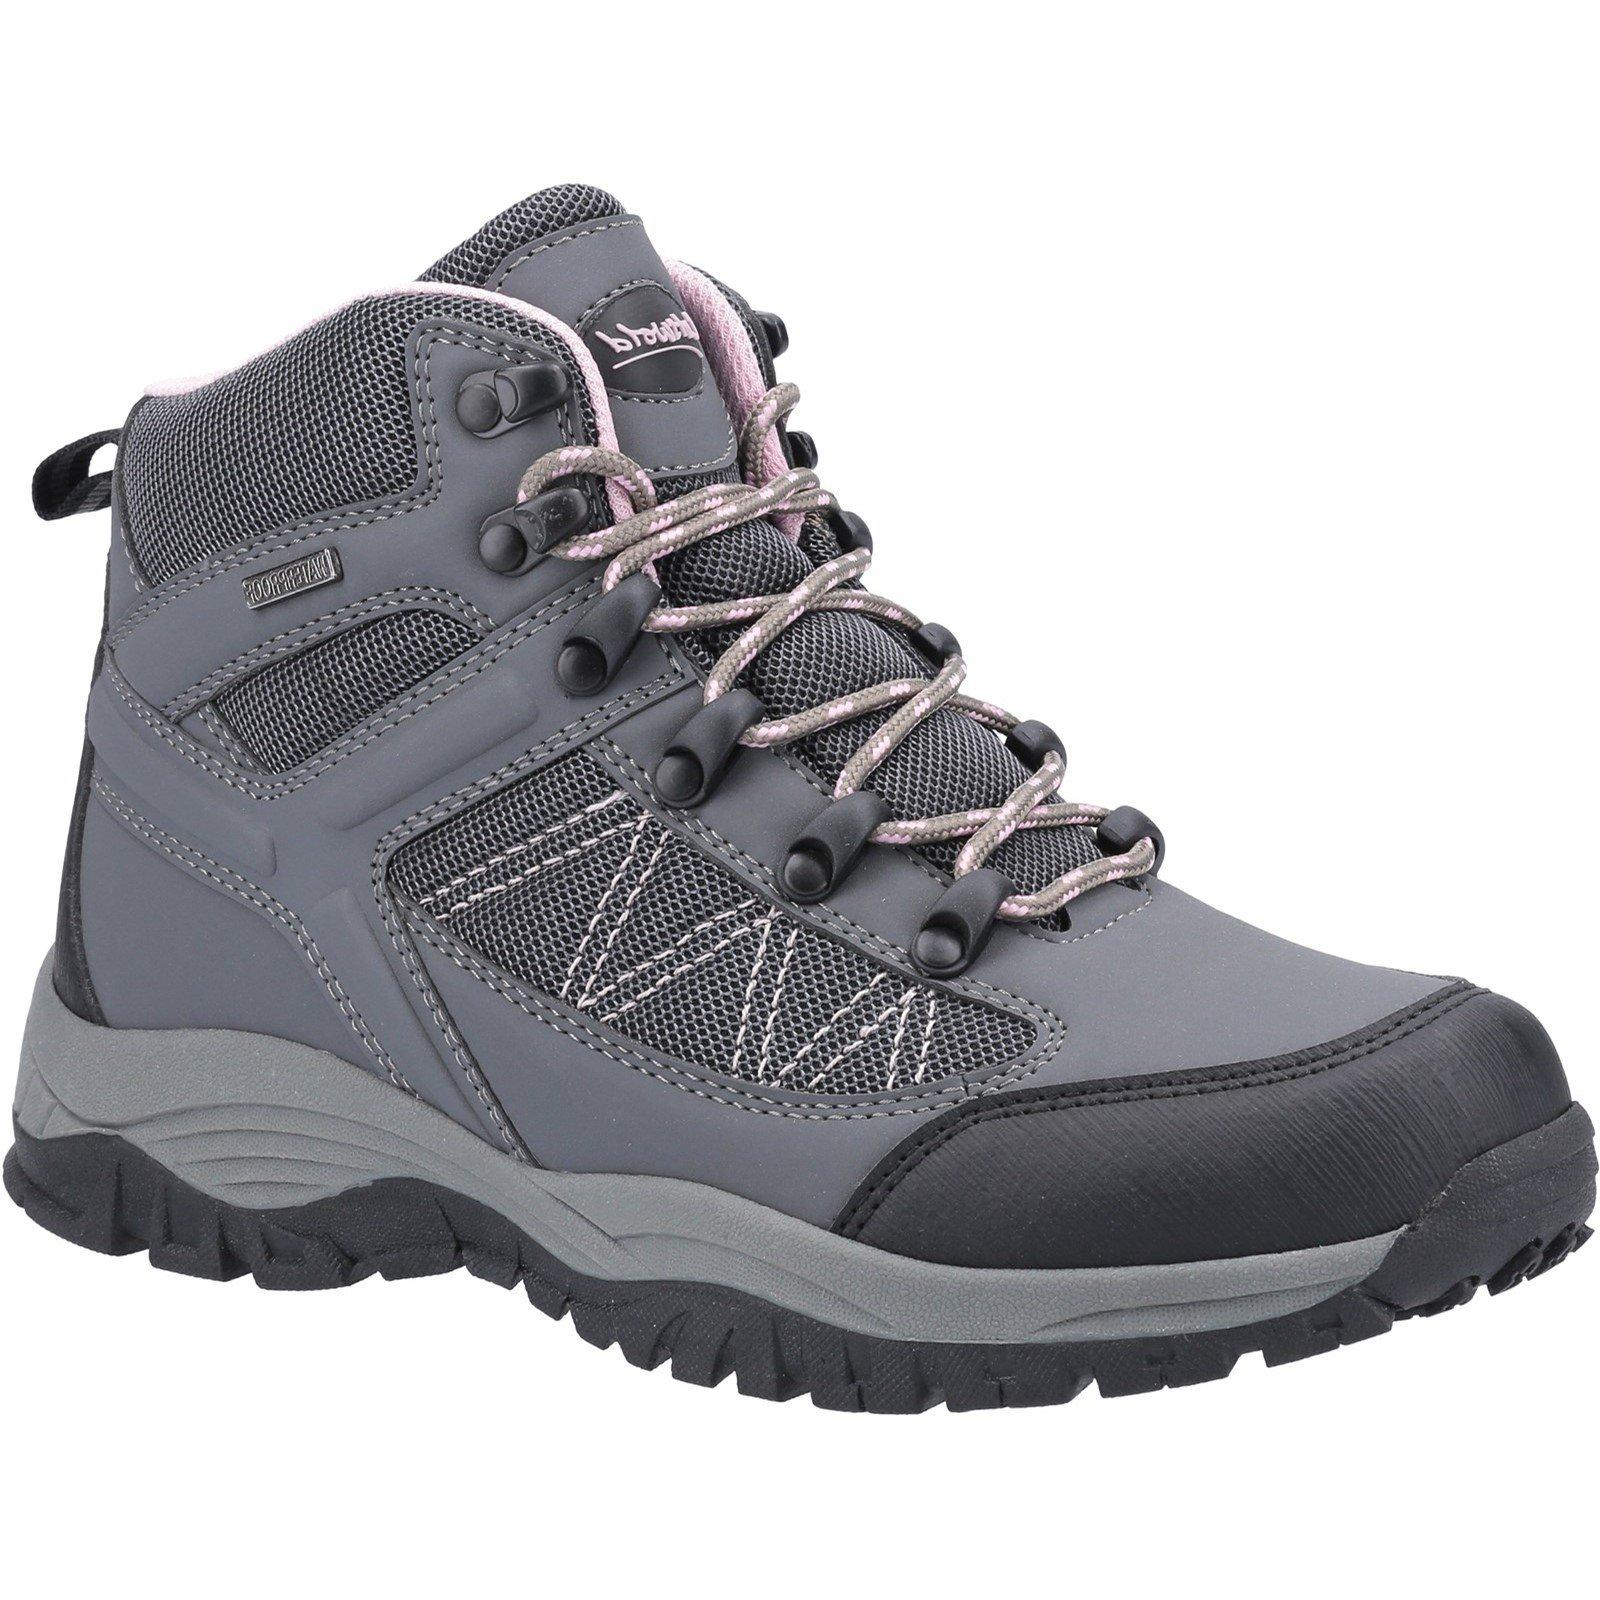 Cotswold Women's Maisemore Hiking Boot Grey 32986 - Grey 3